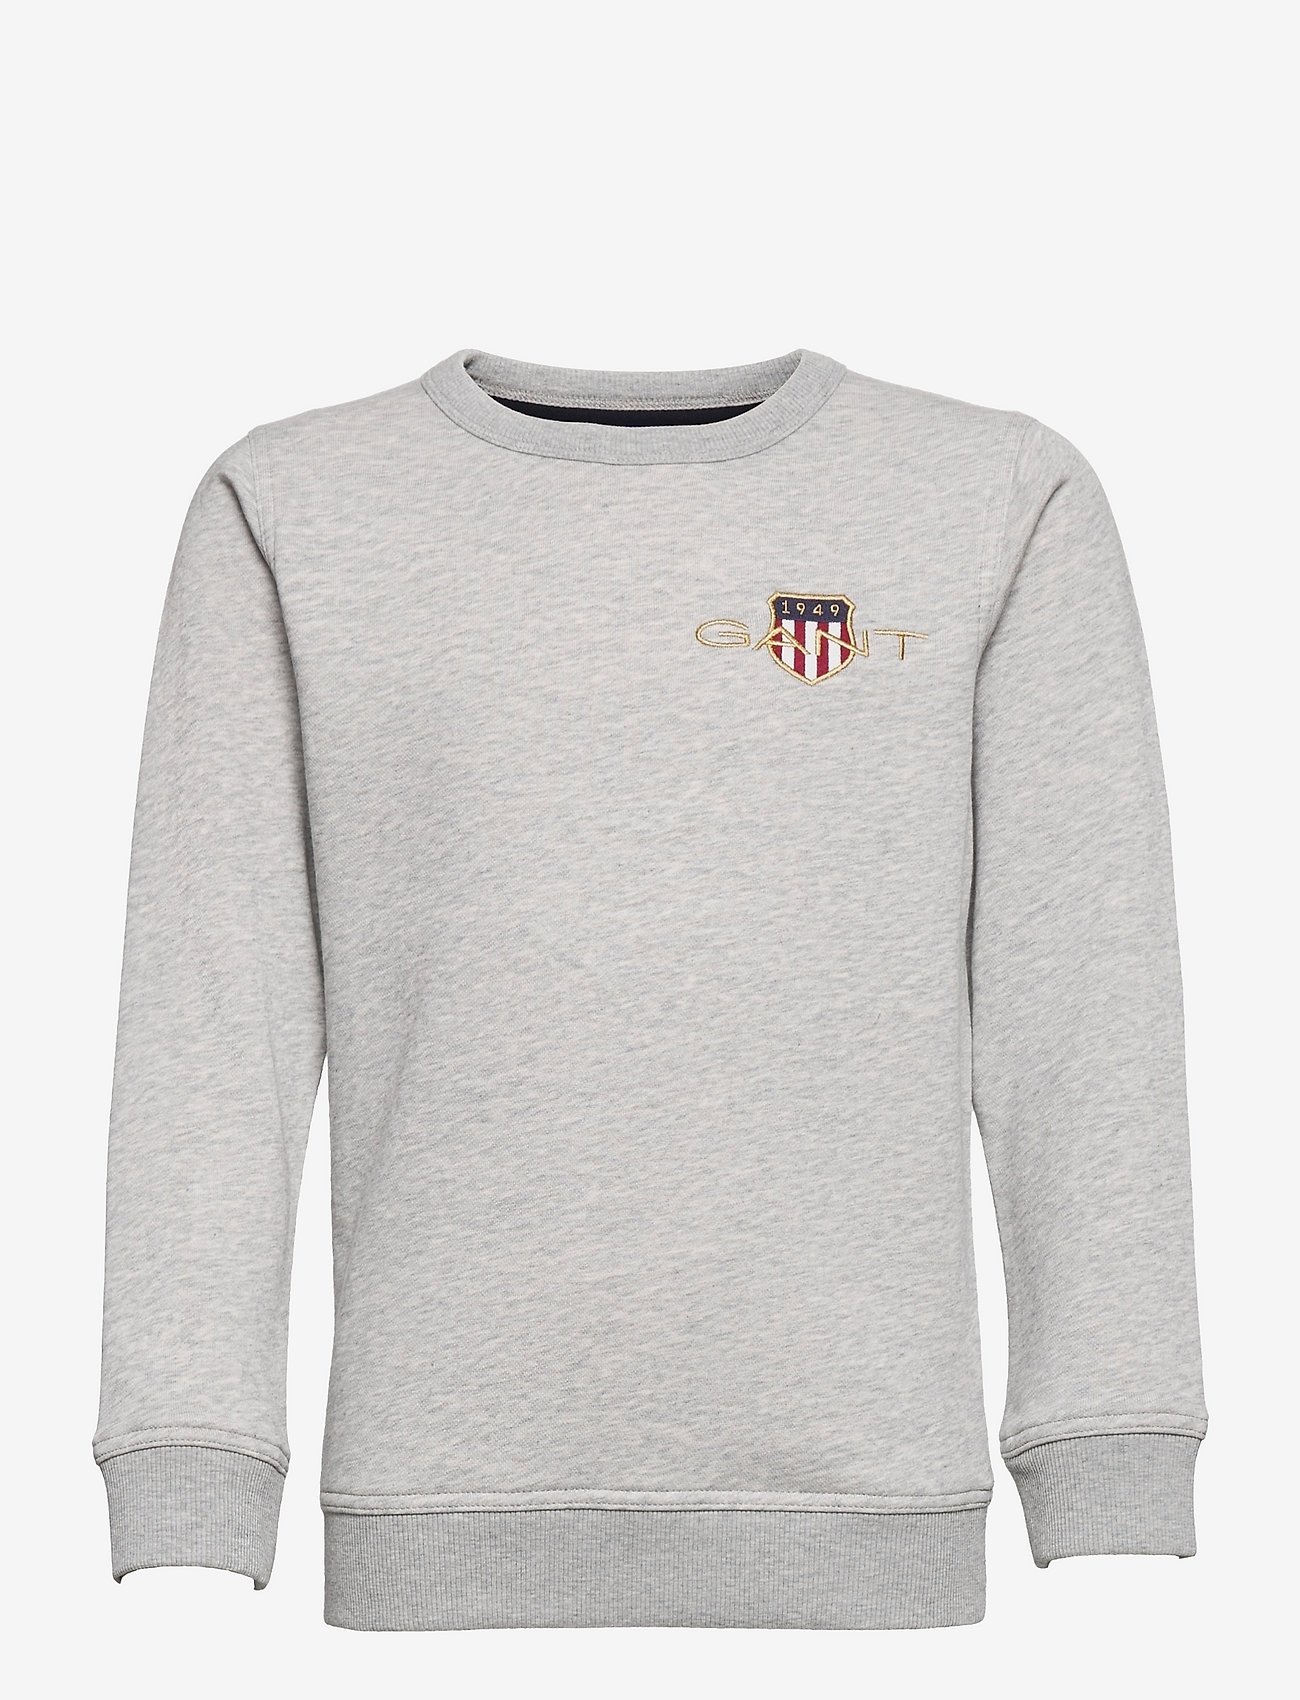 GANT - ARCHIVE SHIELD EMB C-NECK - sweatshirts - light grey melange - 0